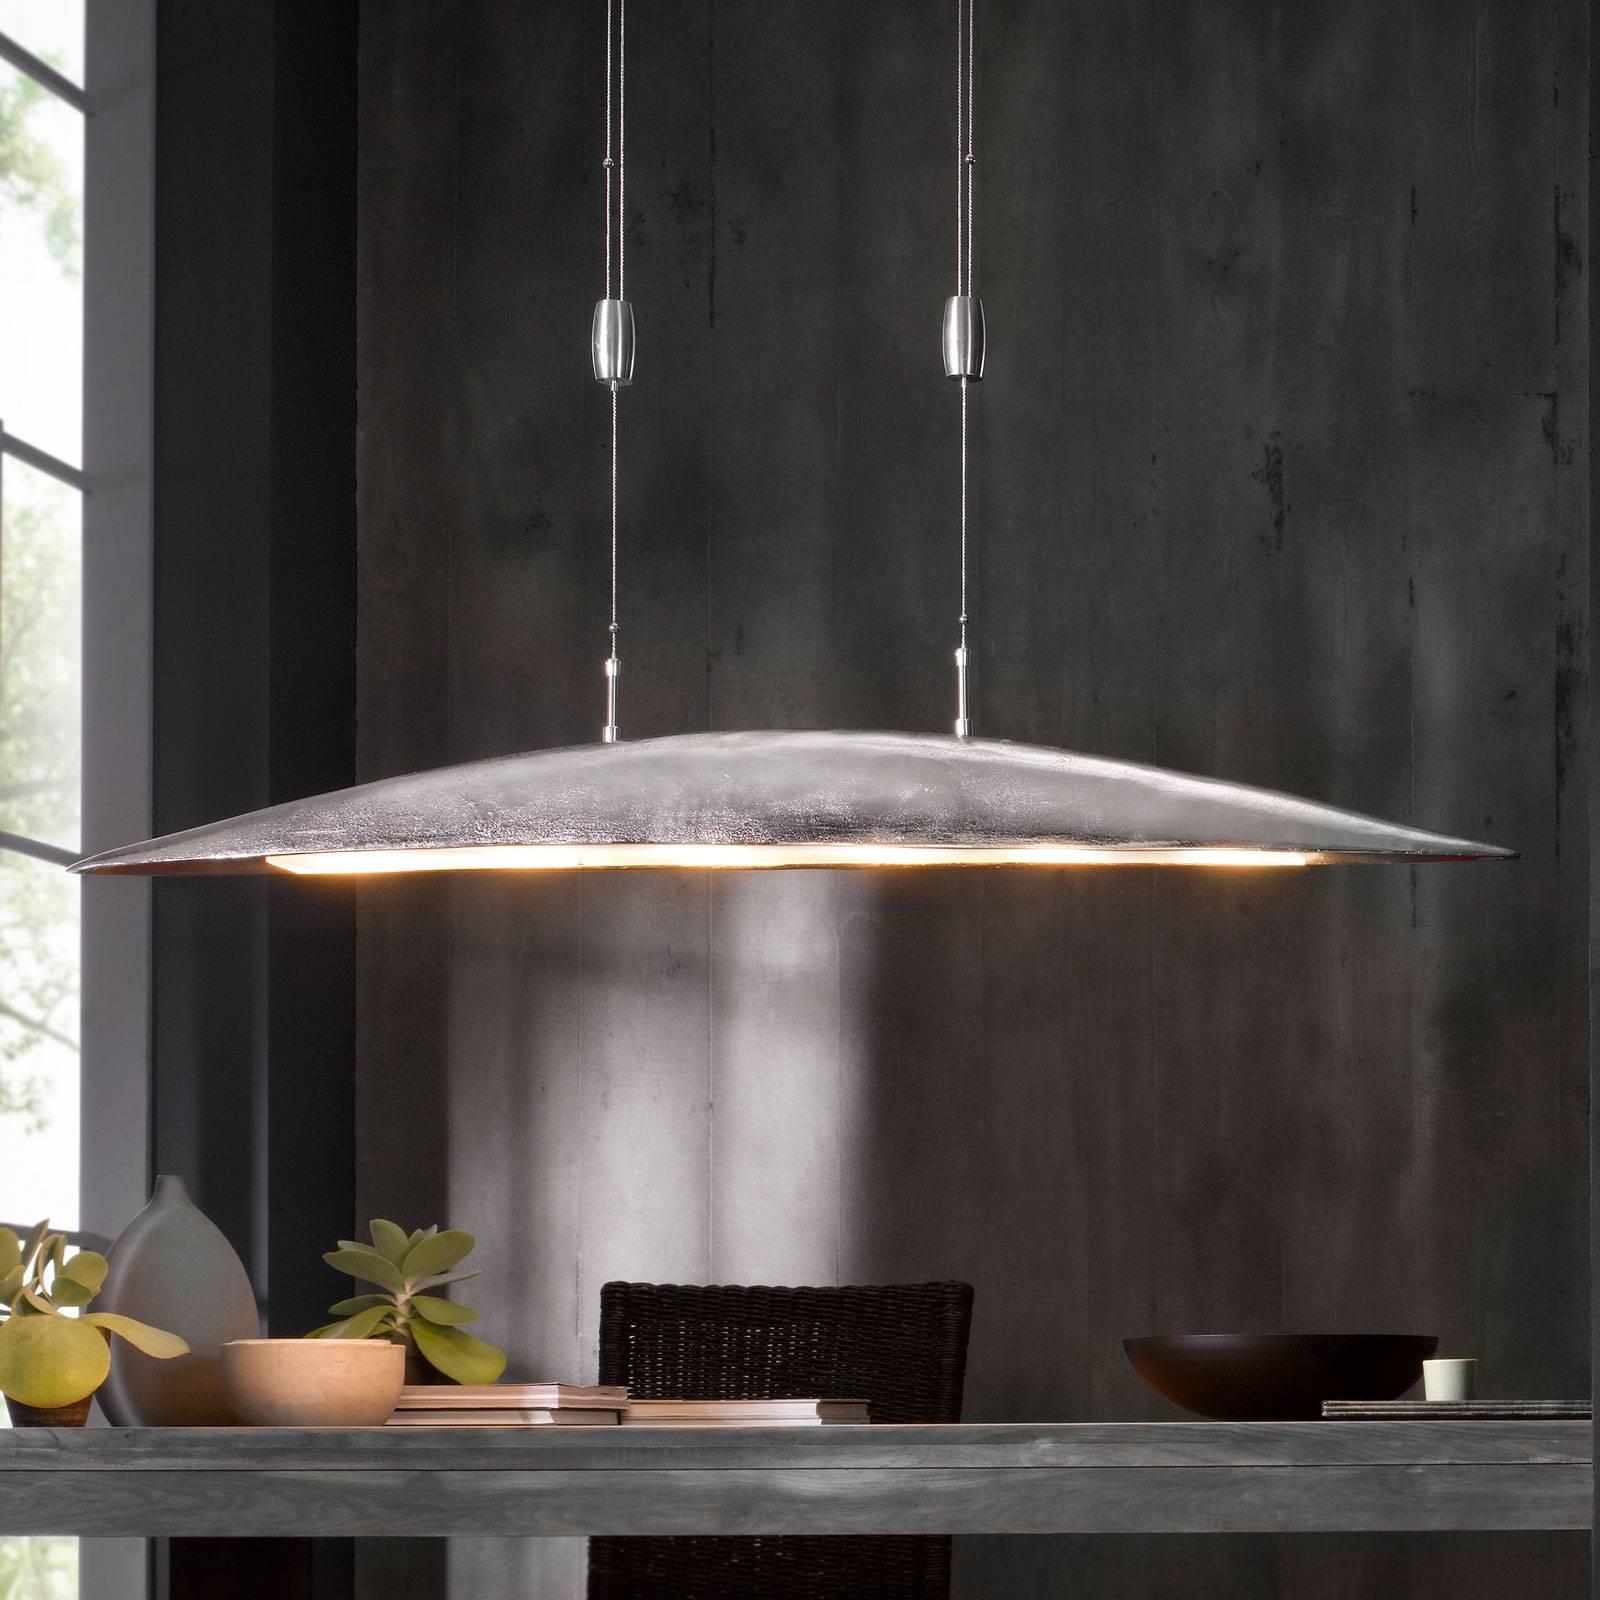 Colmar-LED-riippuvalaisin, pituus 140 cm, nikkeliä